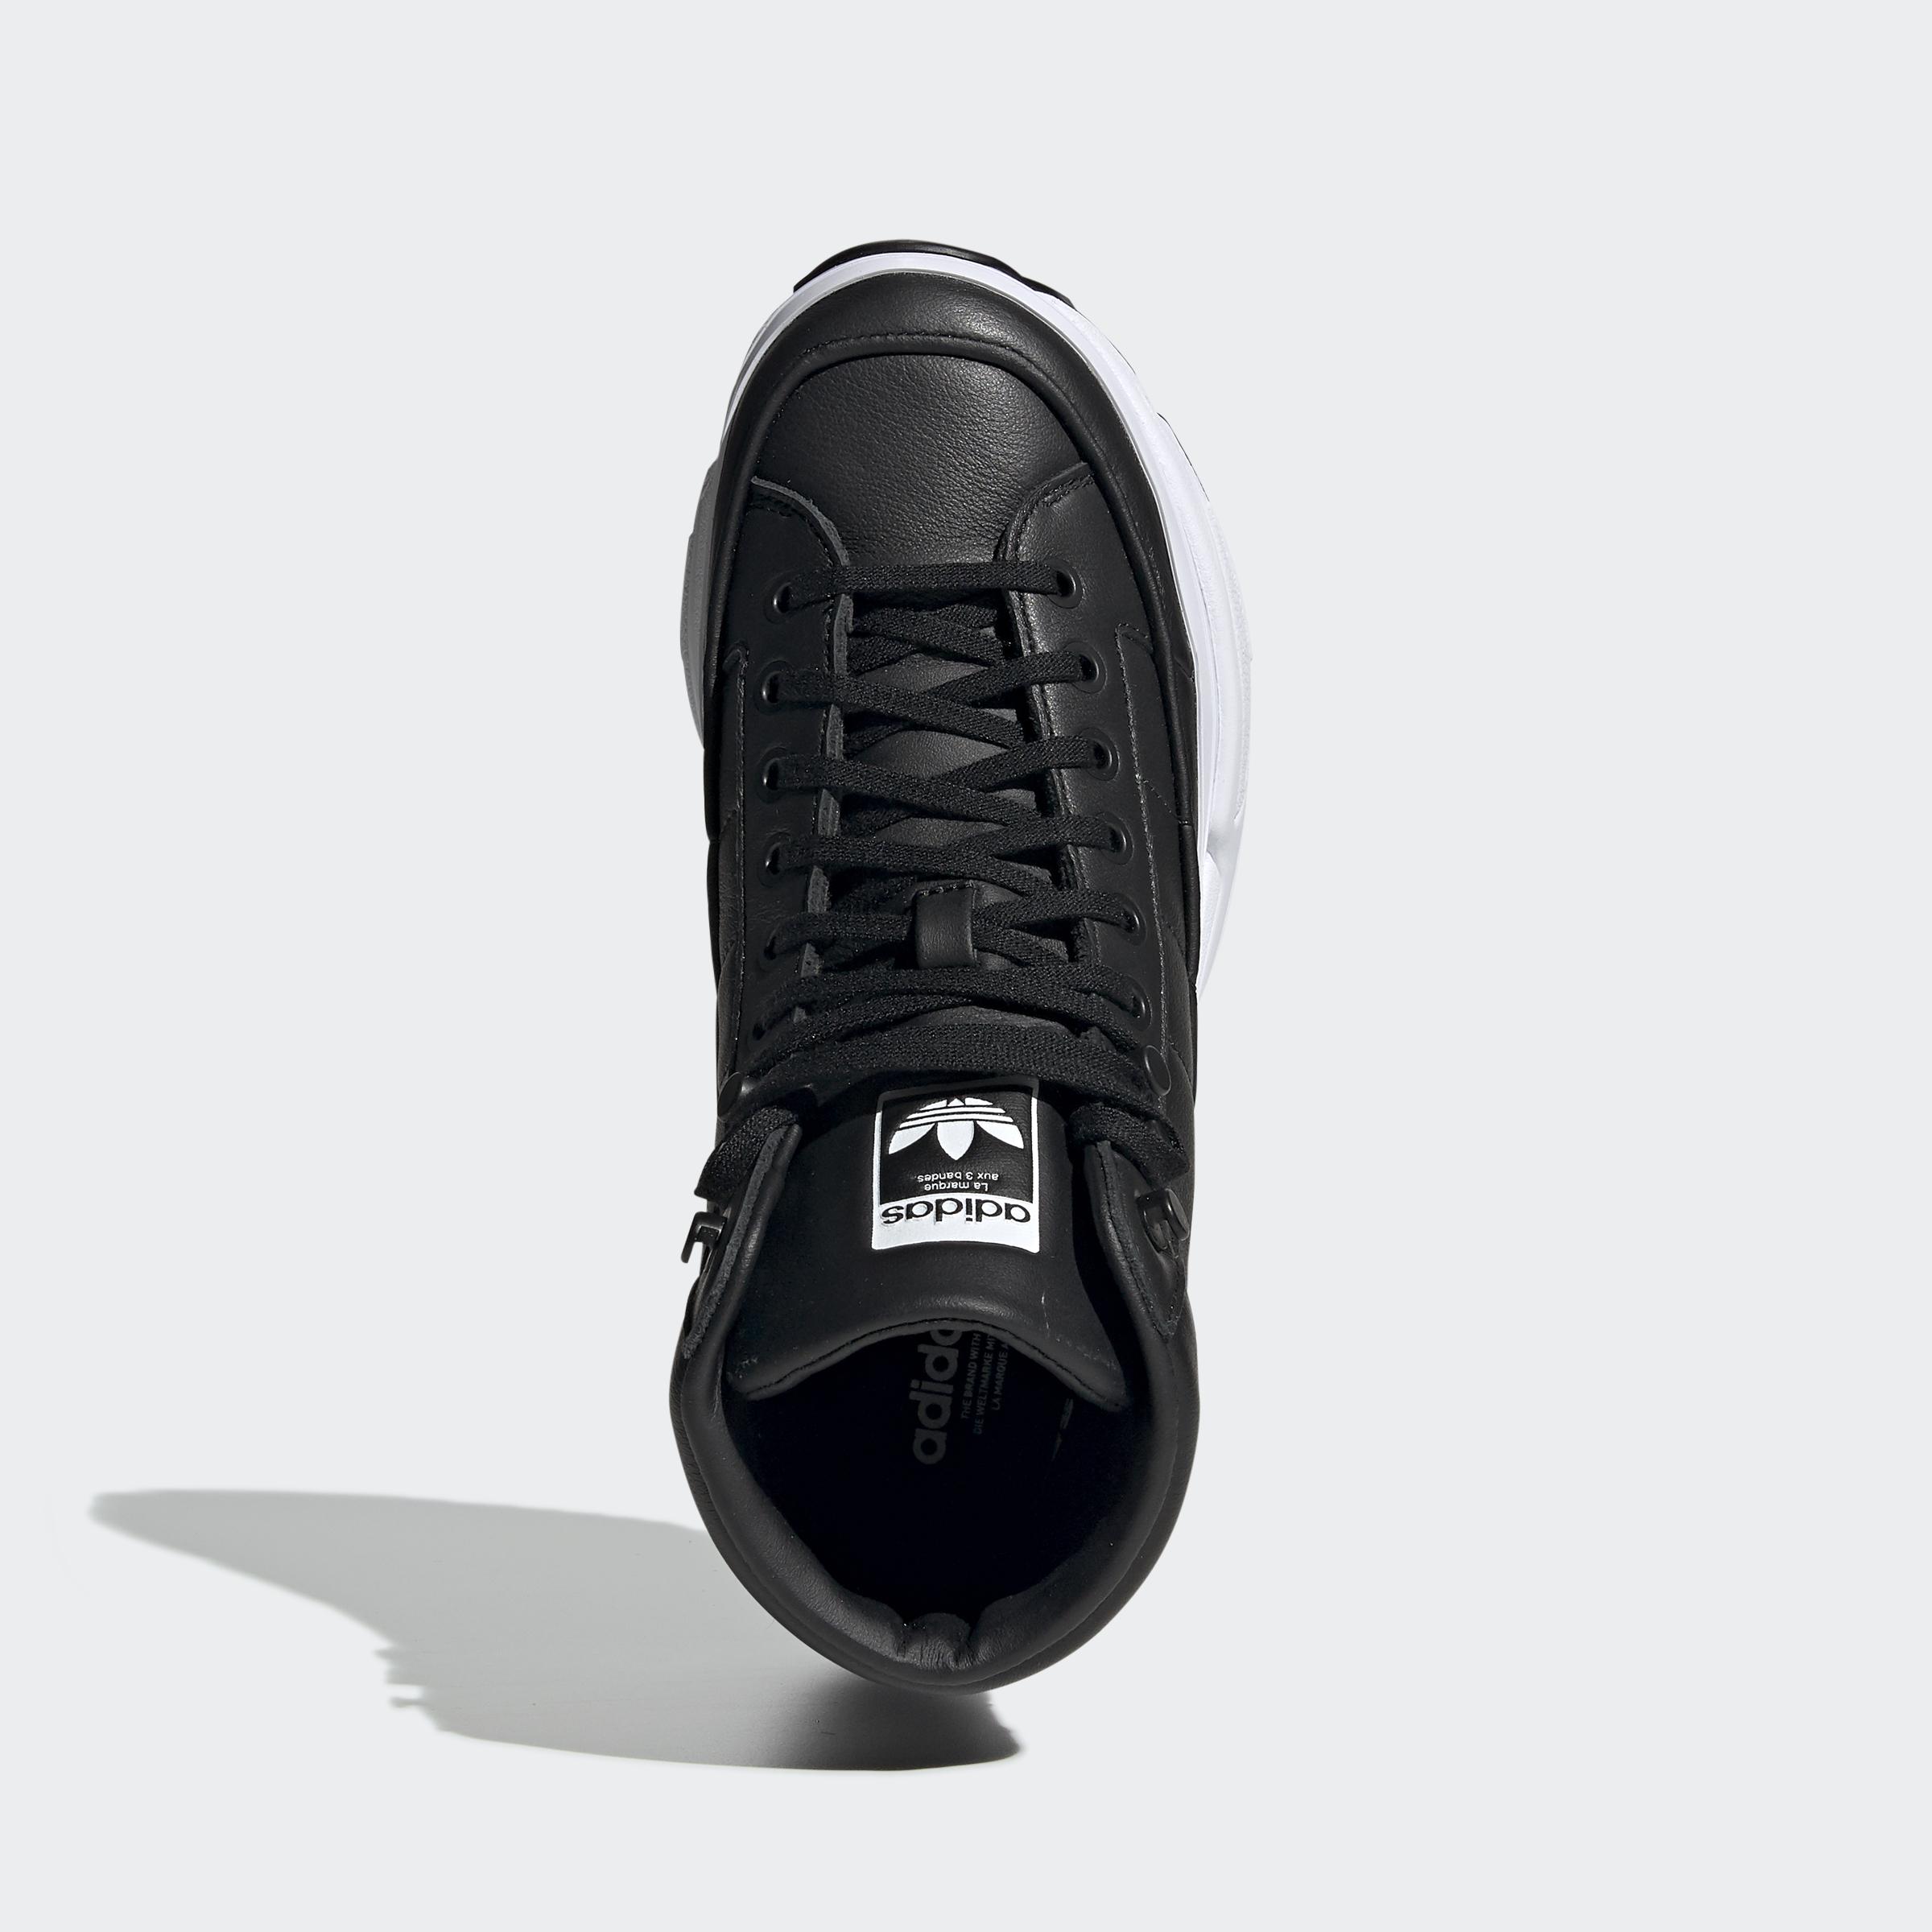 adidas-Kiellor-Xtra-Boots-Women-039-s-Boots thumbnail 14